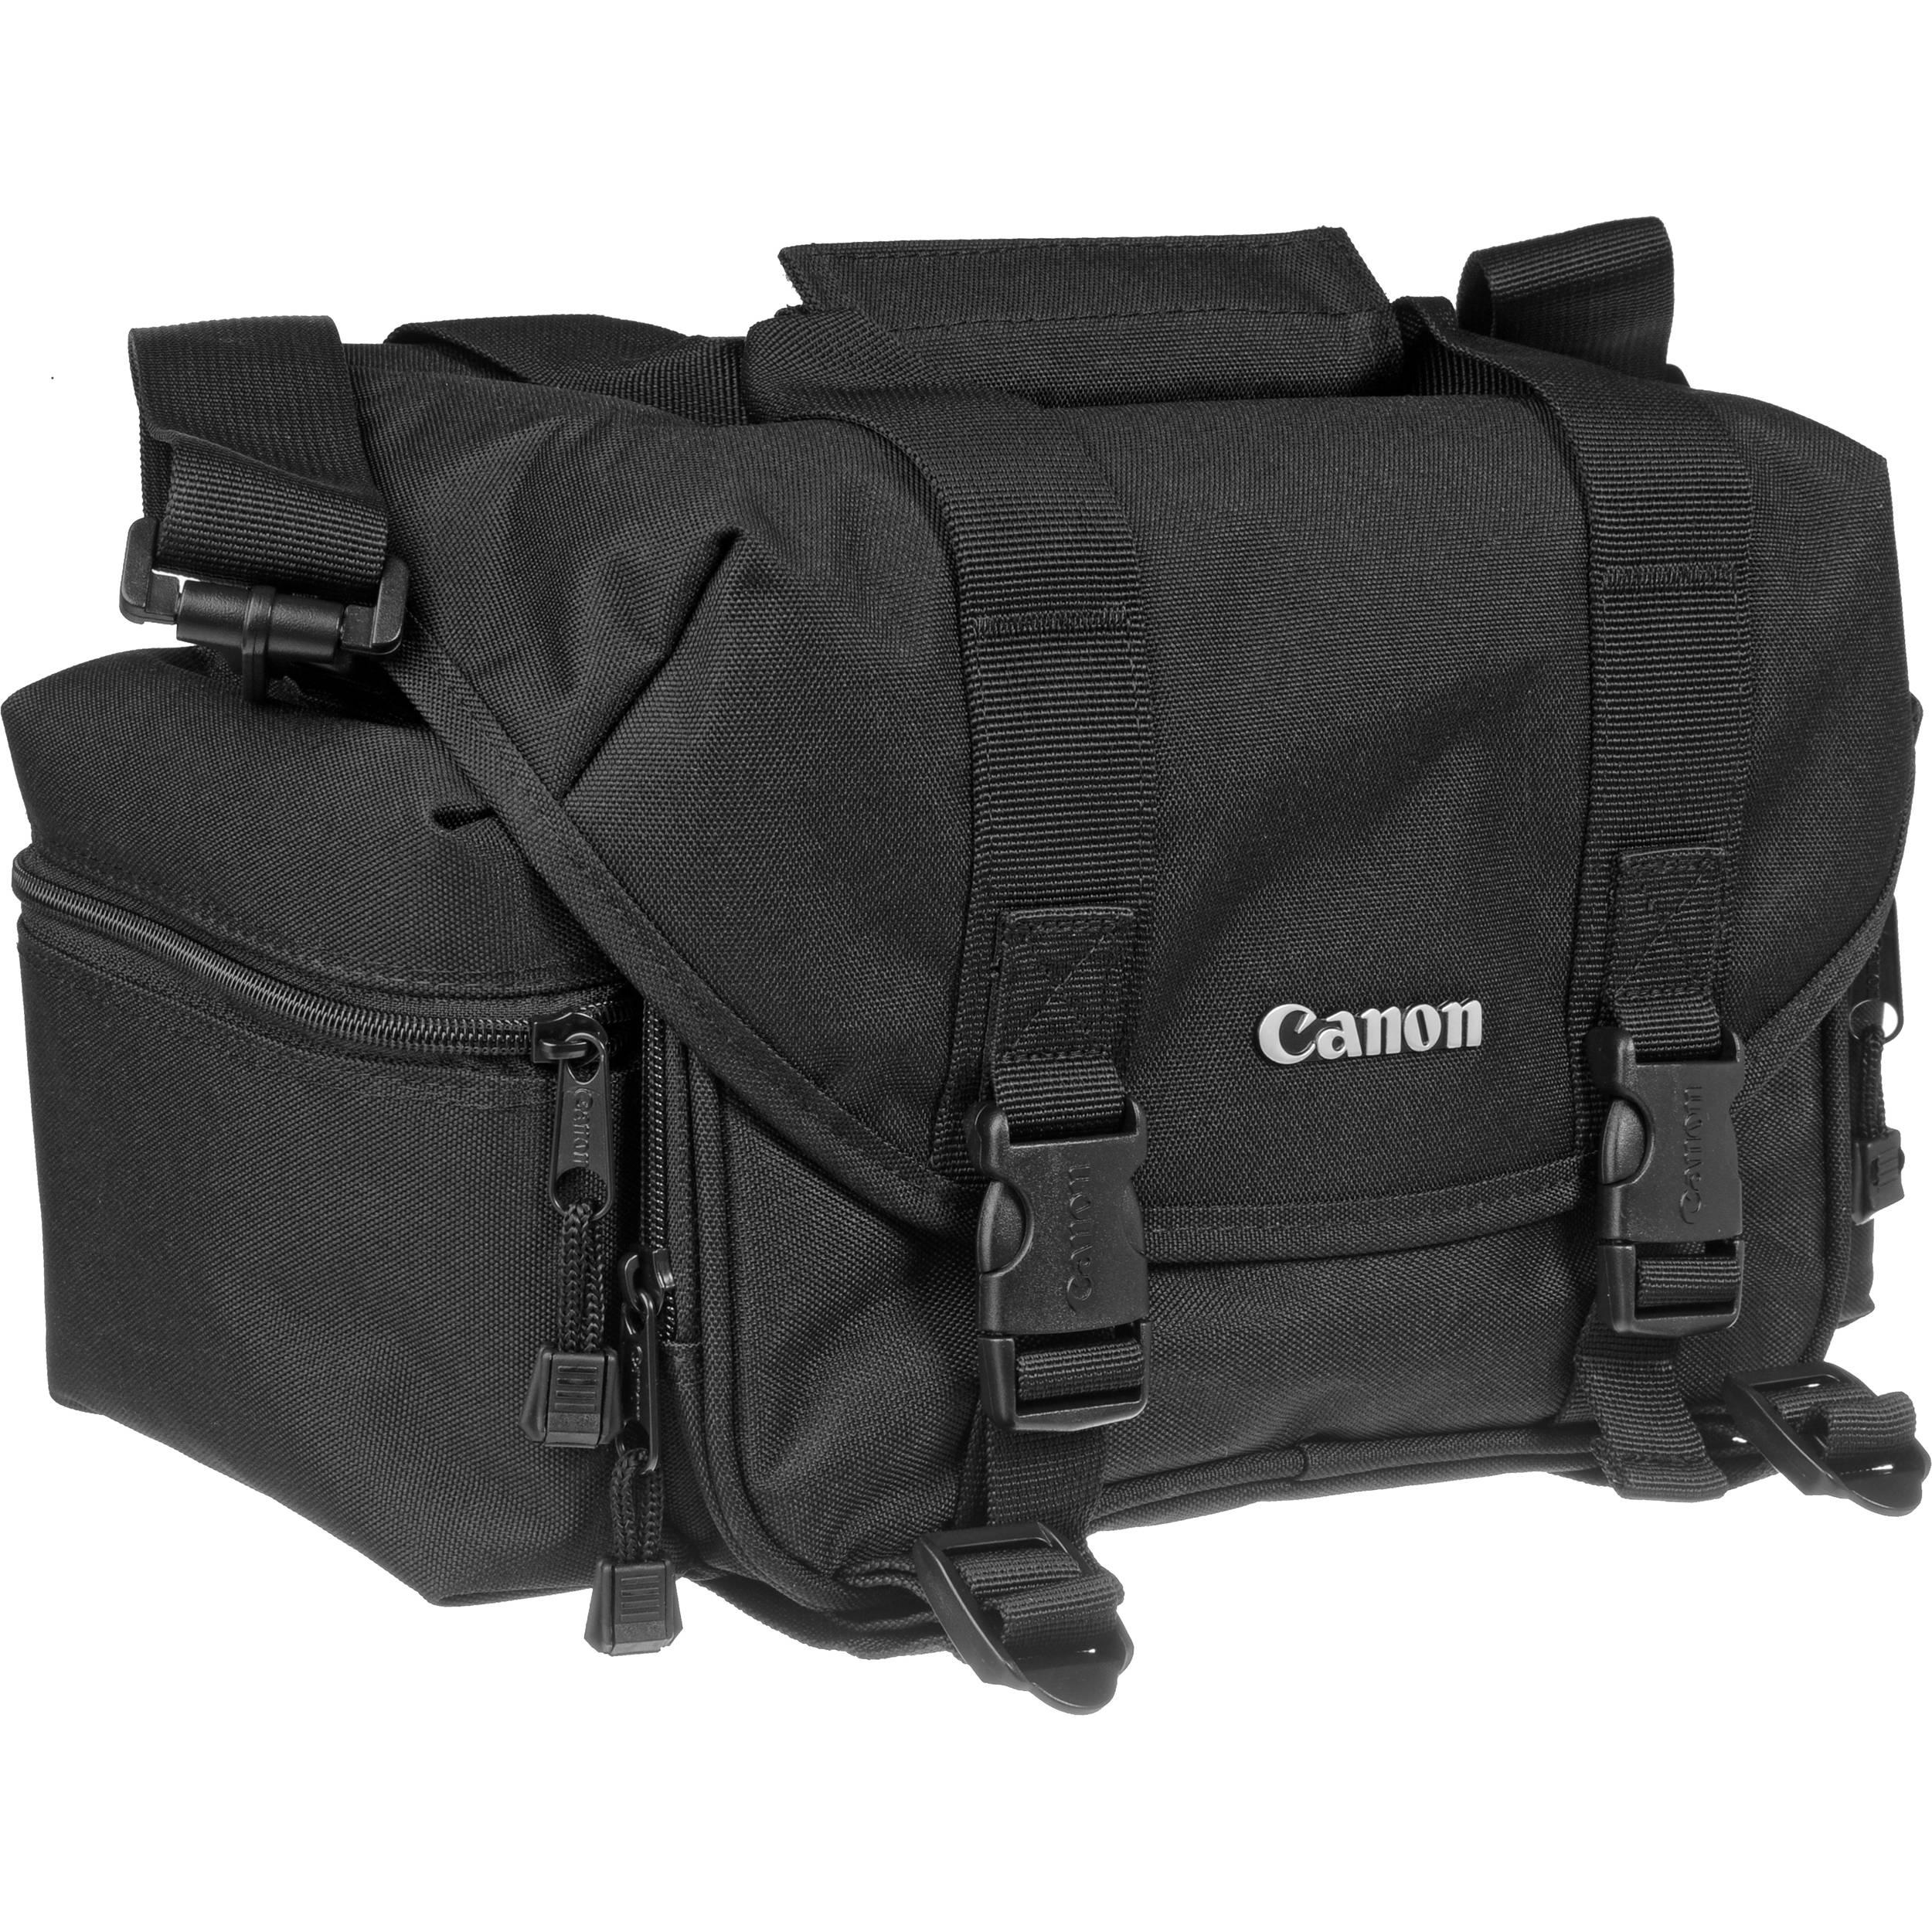 Canon Gadget Bag 2400 (Black with Gray Interior)